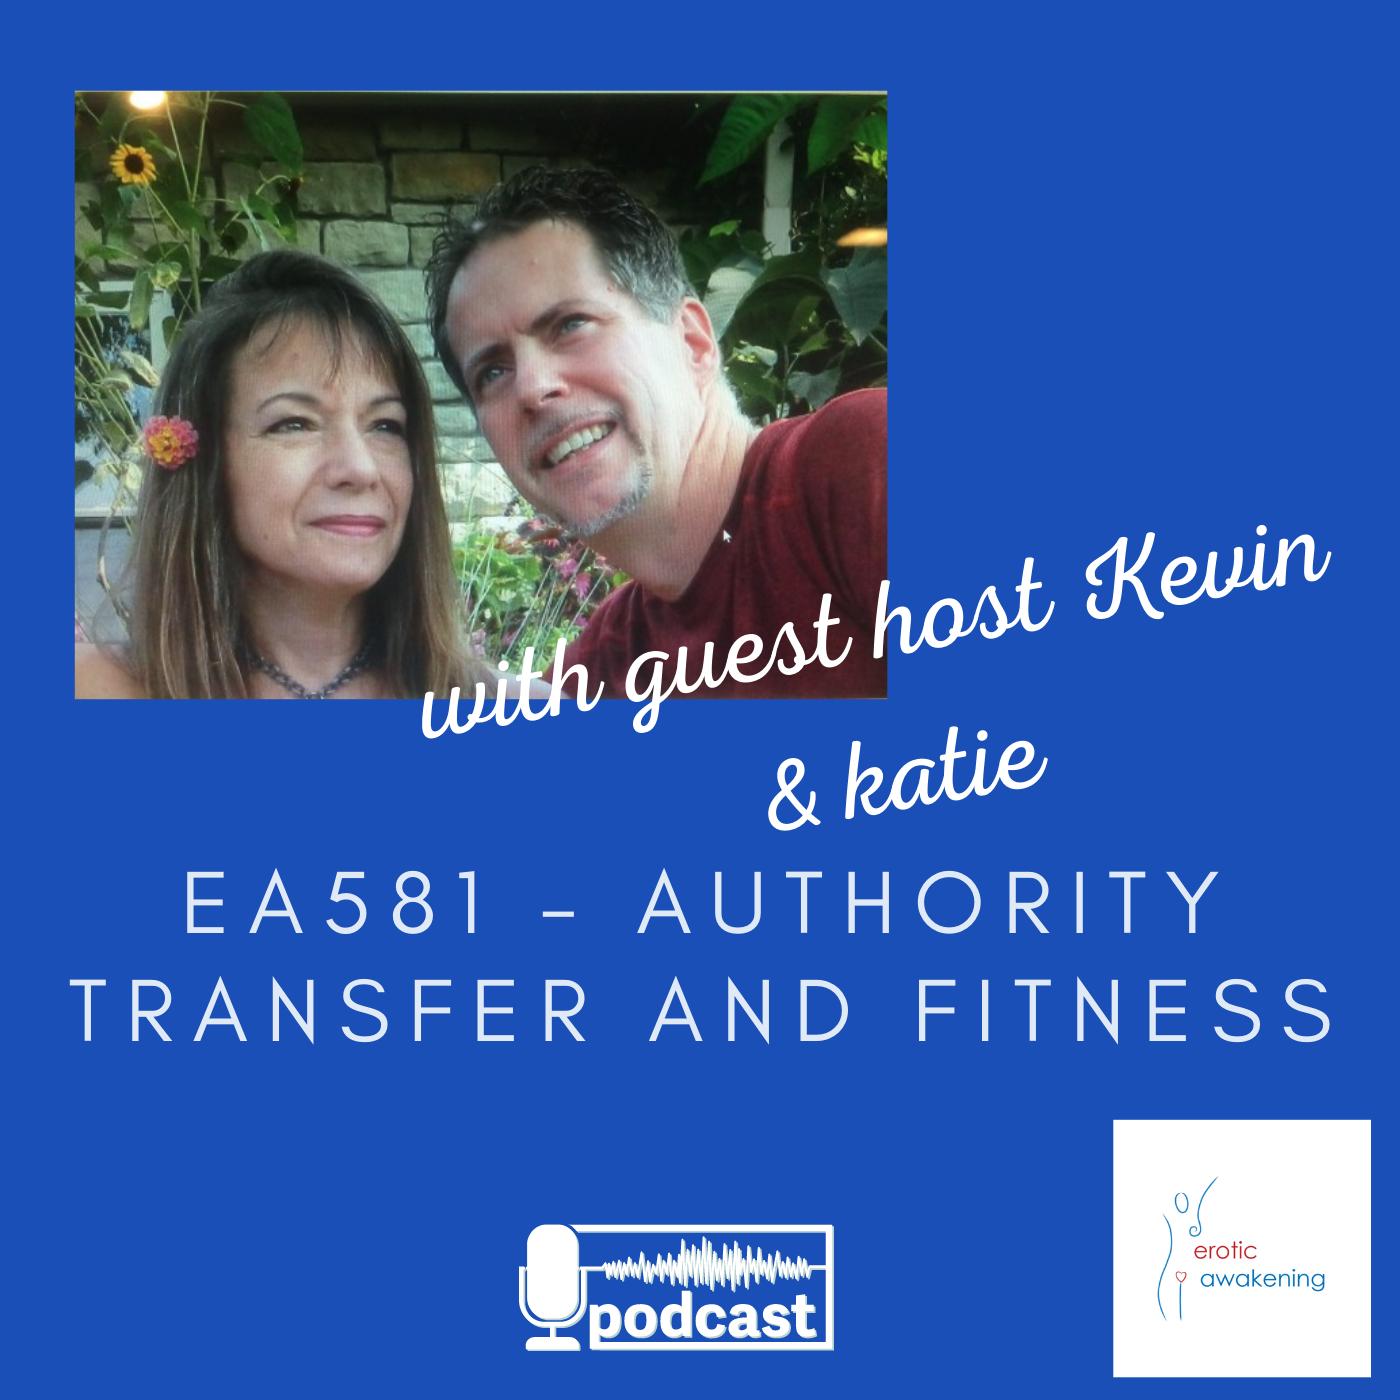 Erotic Awakening Podcast - EA581 - Fitness and Authority Transfer